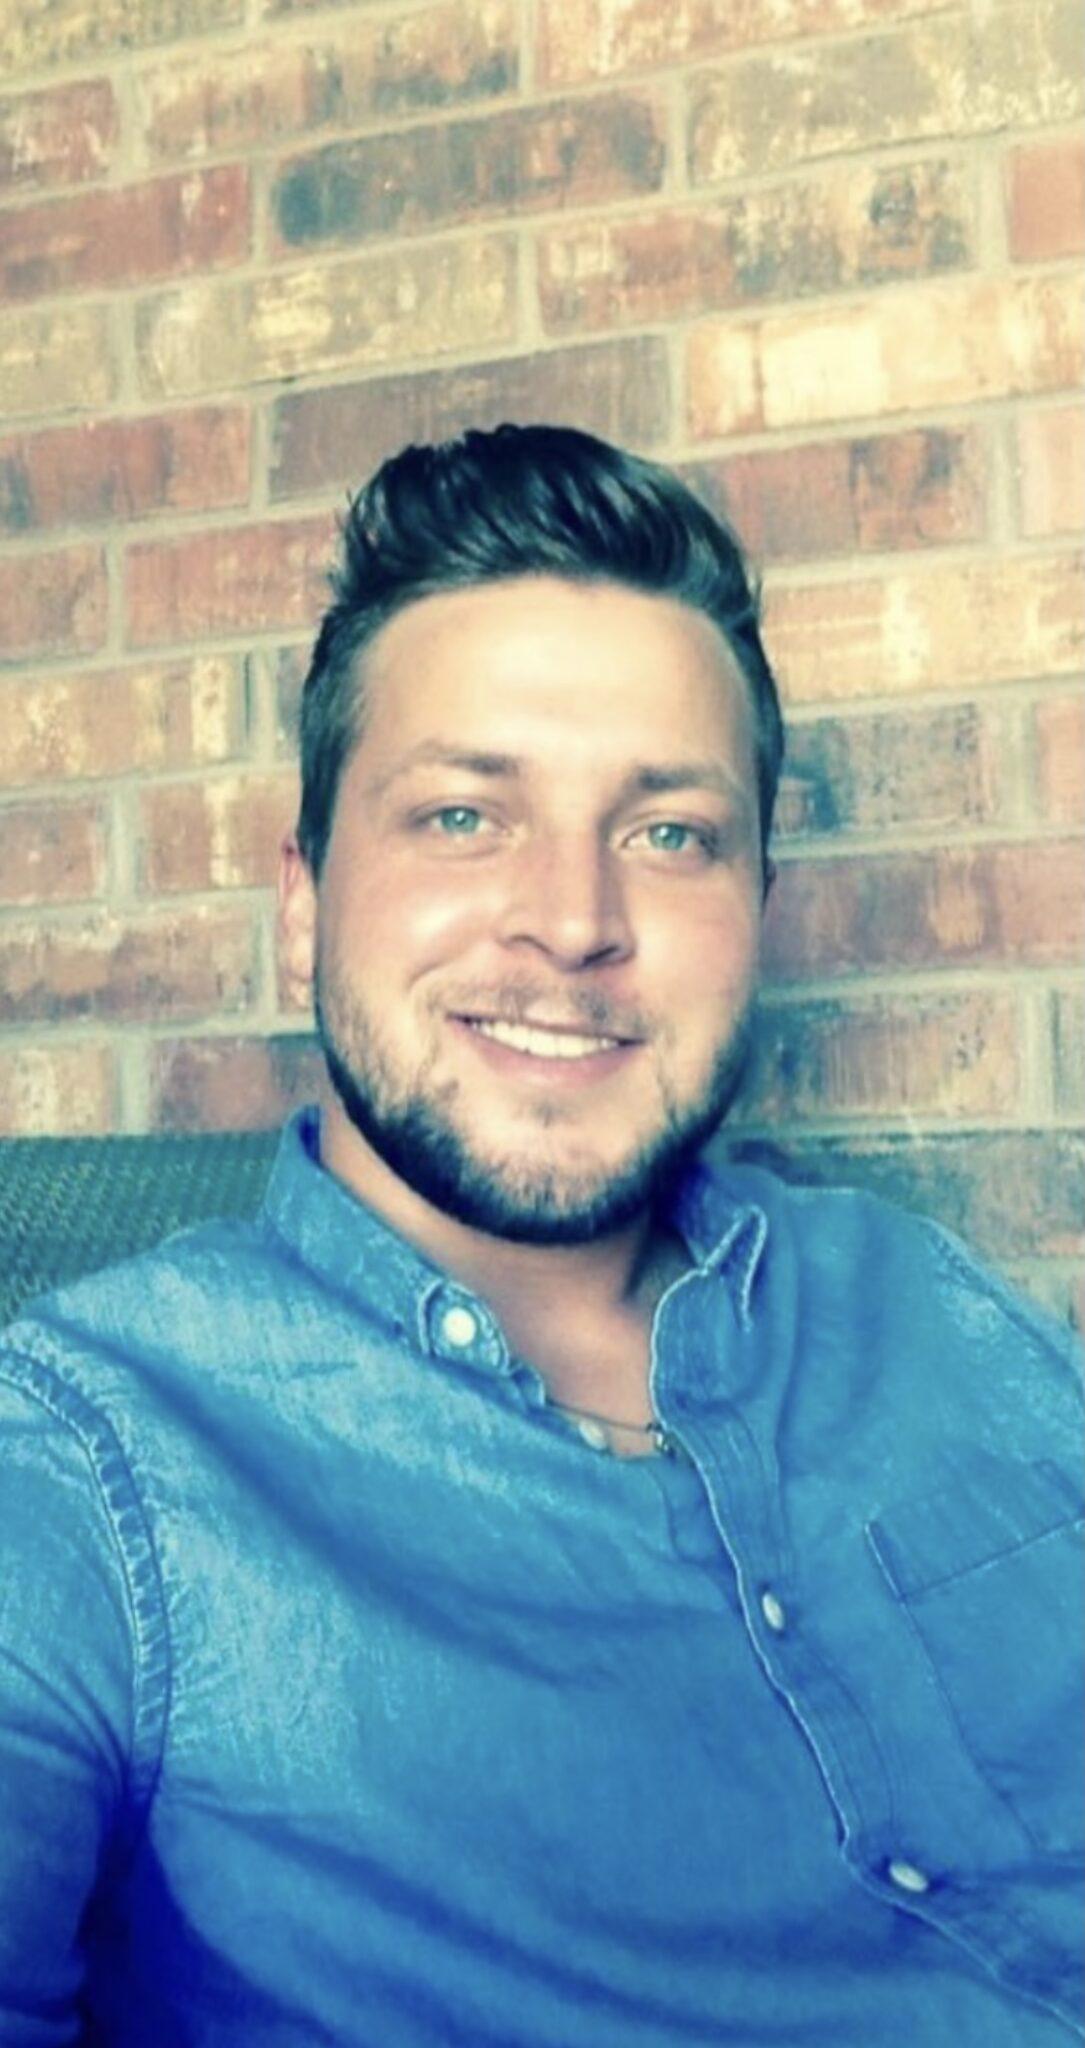 Austin Caleb Gifford